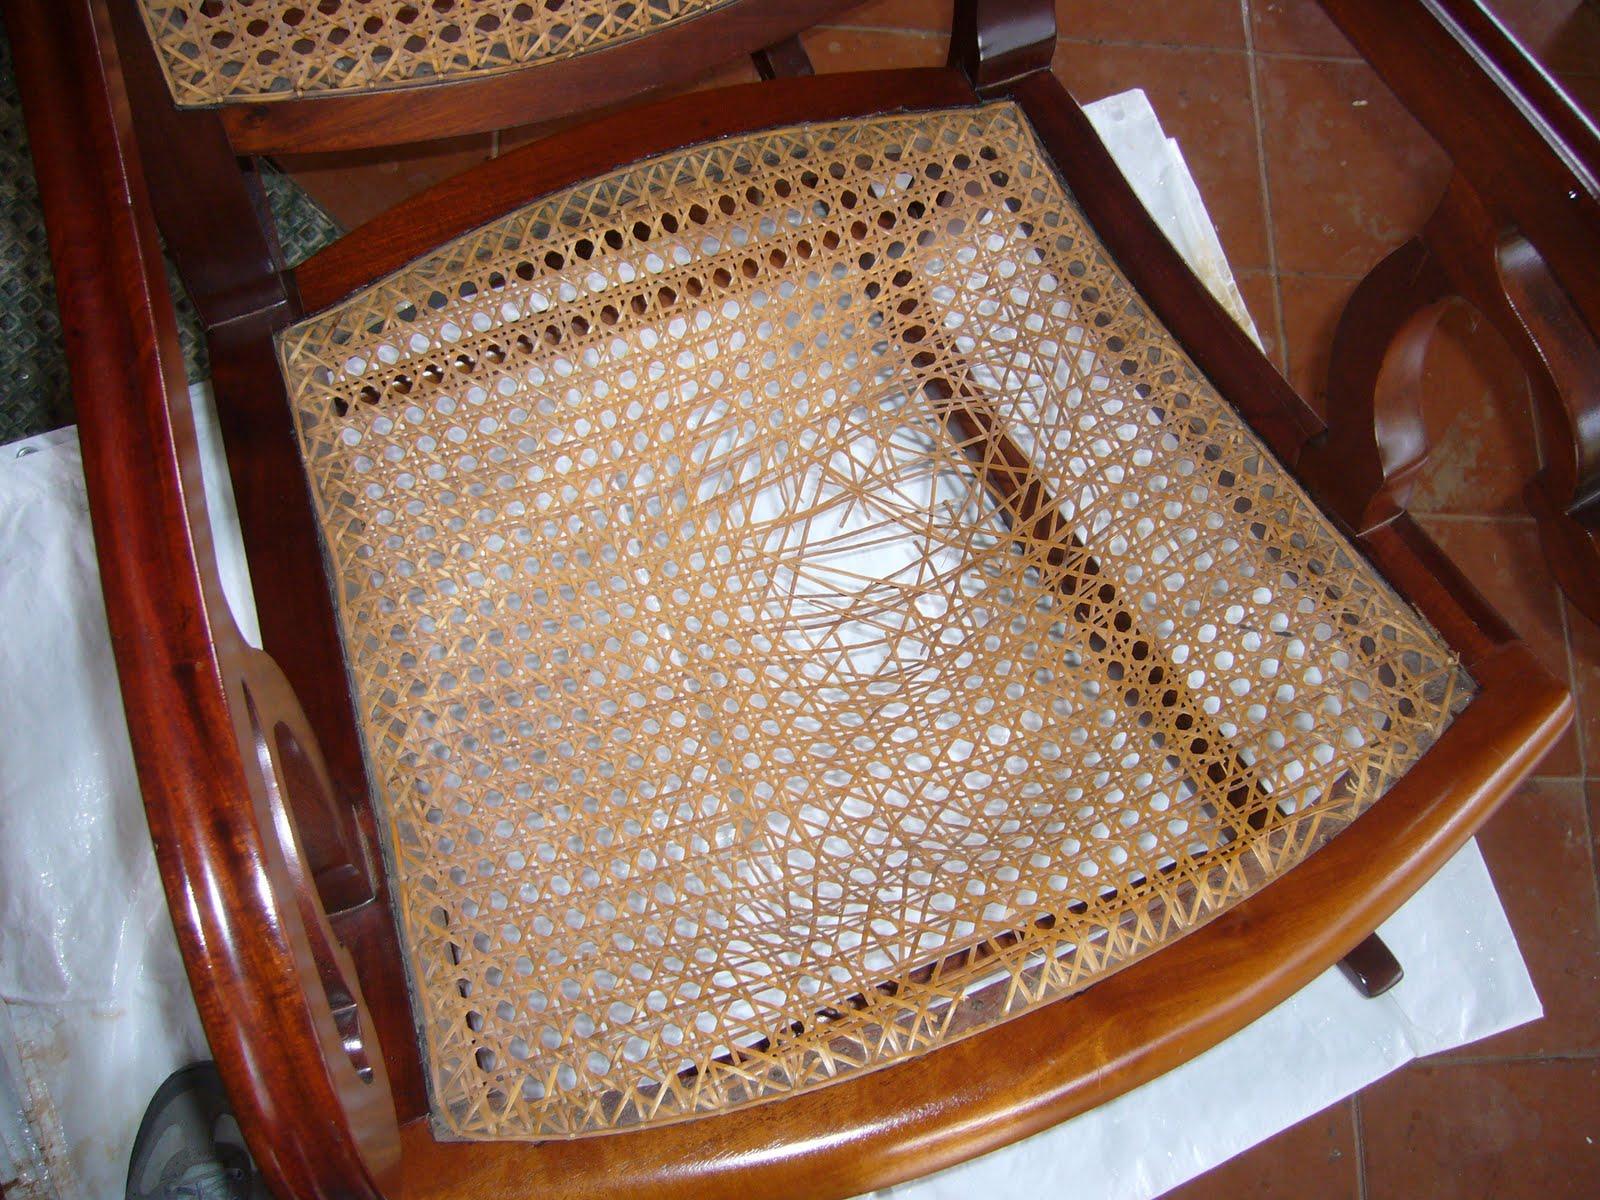 Restauraci N Del Asiento De Rejilla De Una Mecedora Cubana La  # Muebles Rejilla